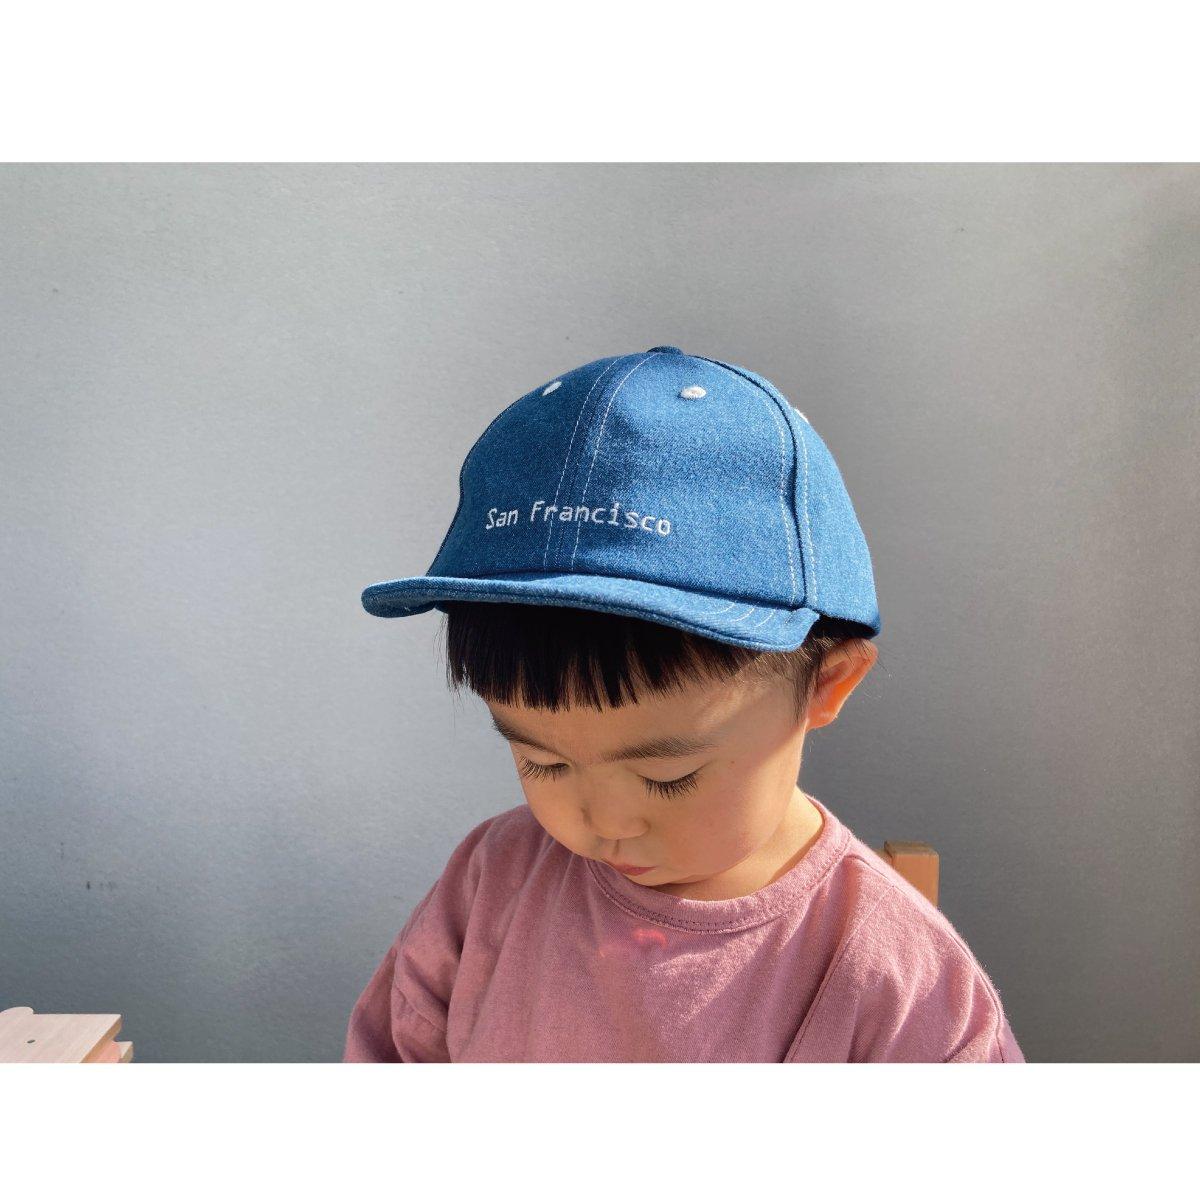 【KIDS】USA Twill Cap 詳細画像32